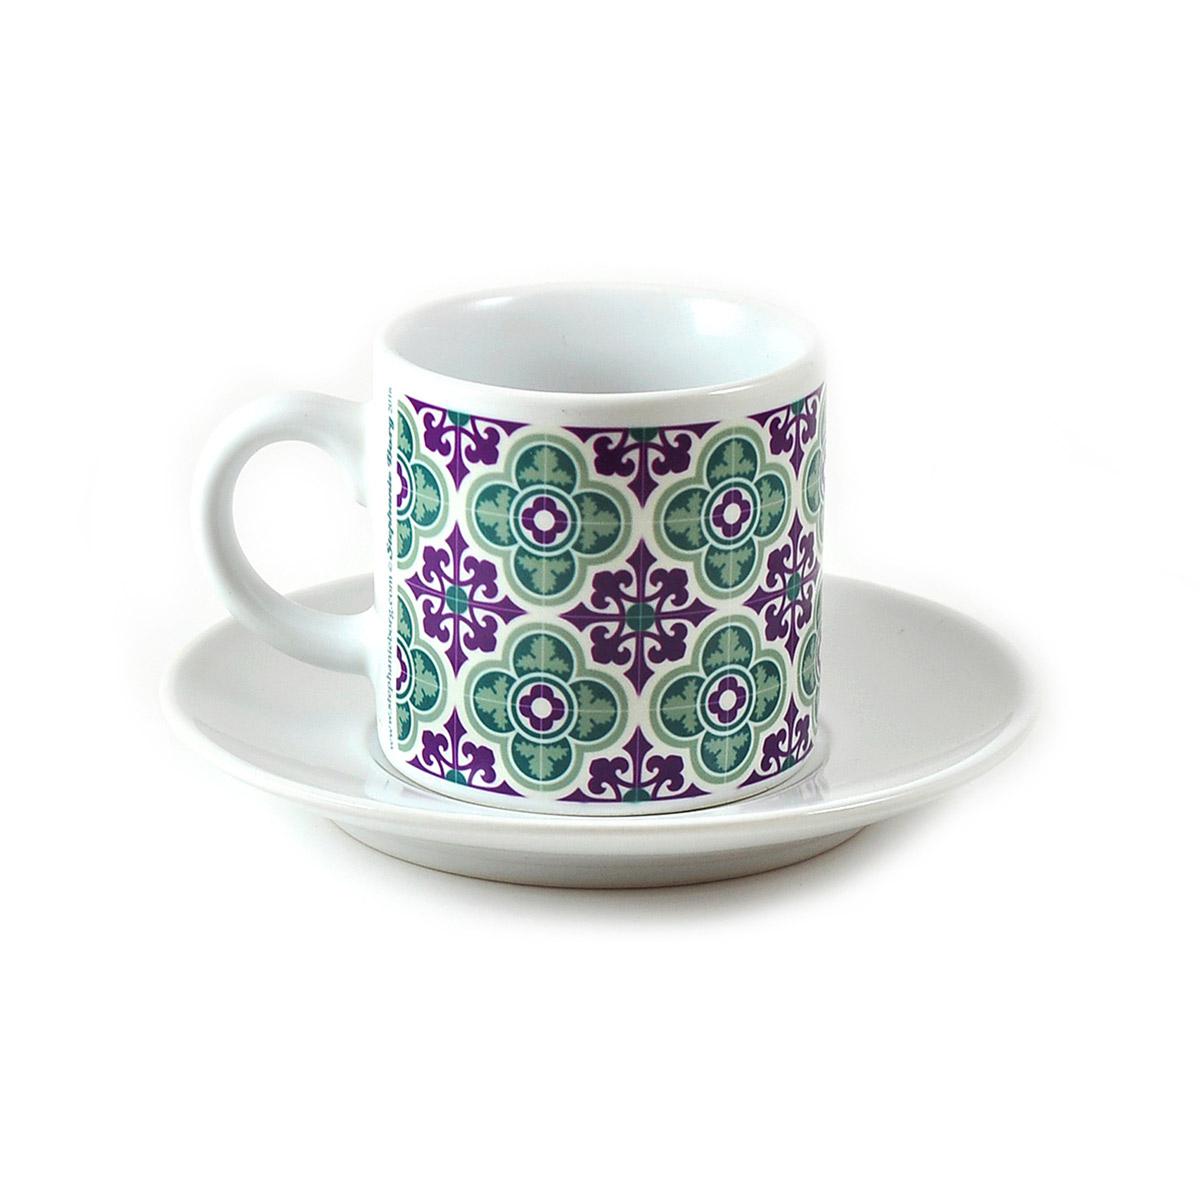 Malta Tile Espresso Cup & Saucer, pattern no.6